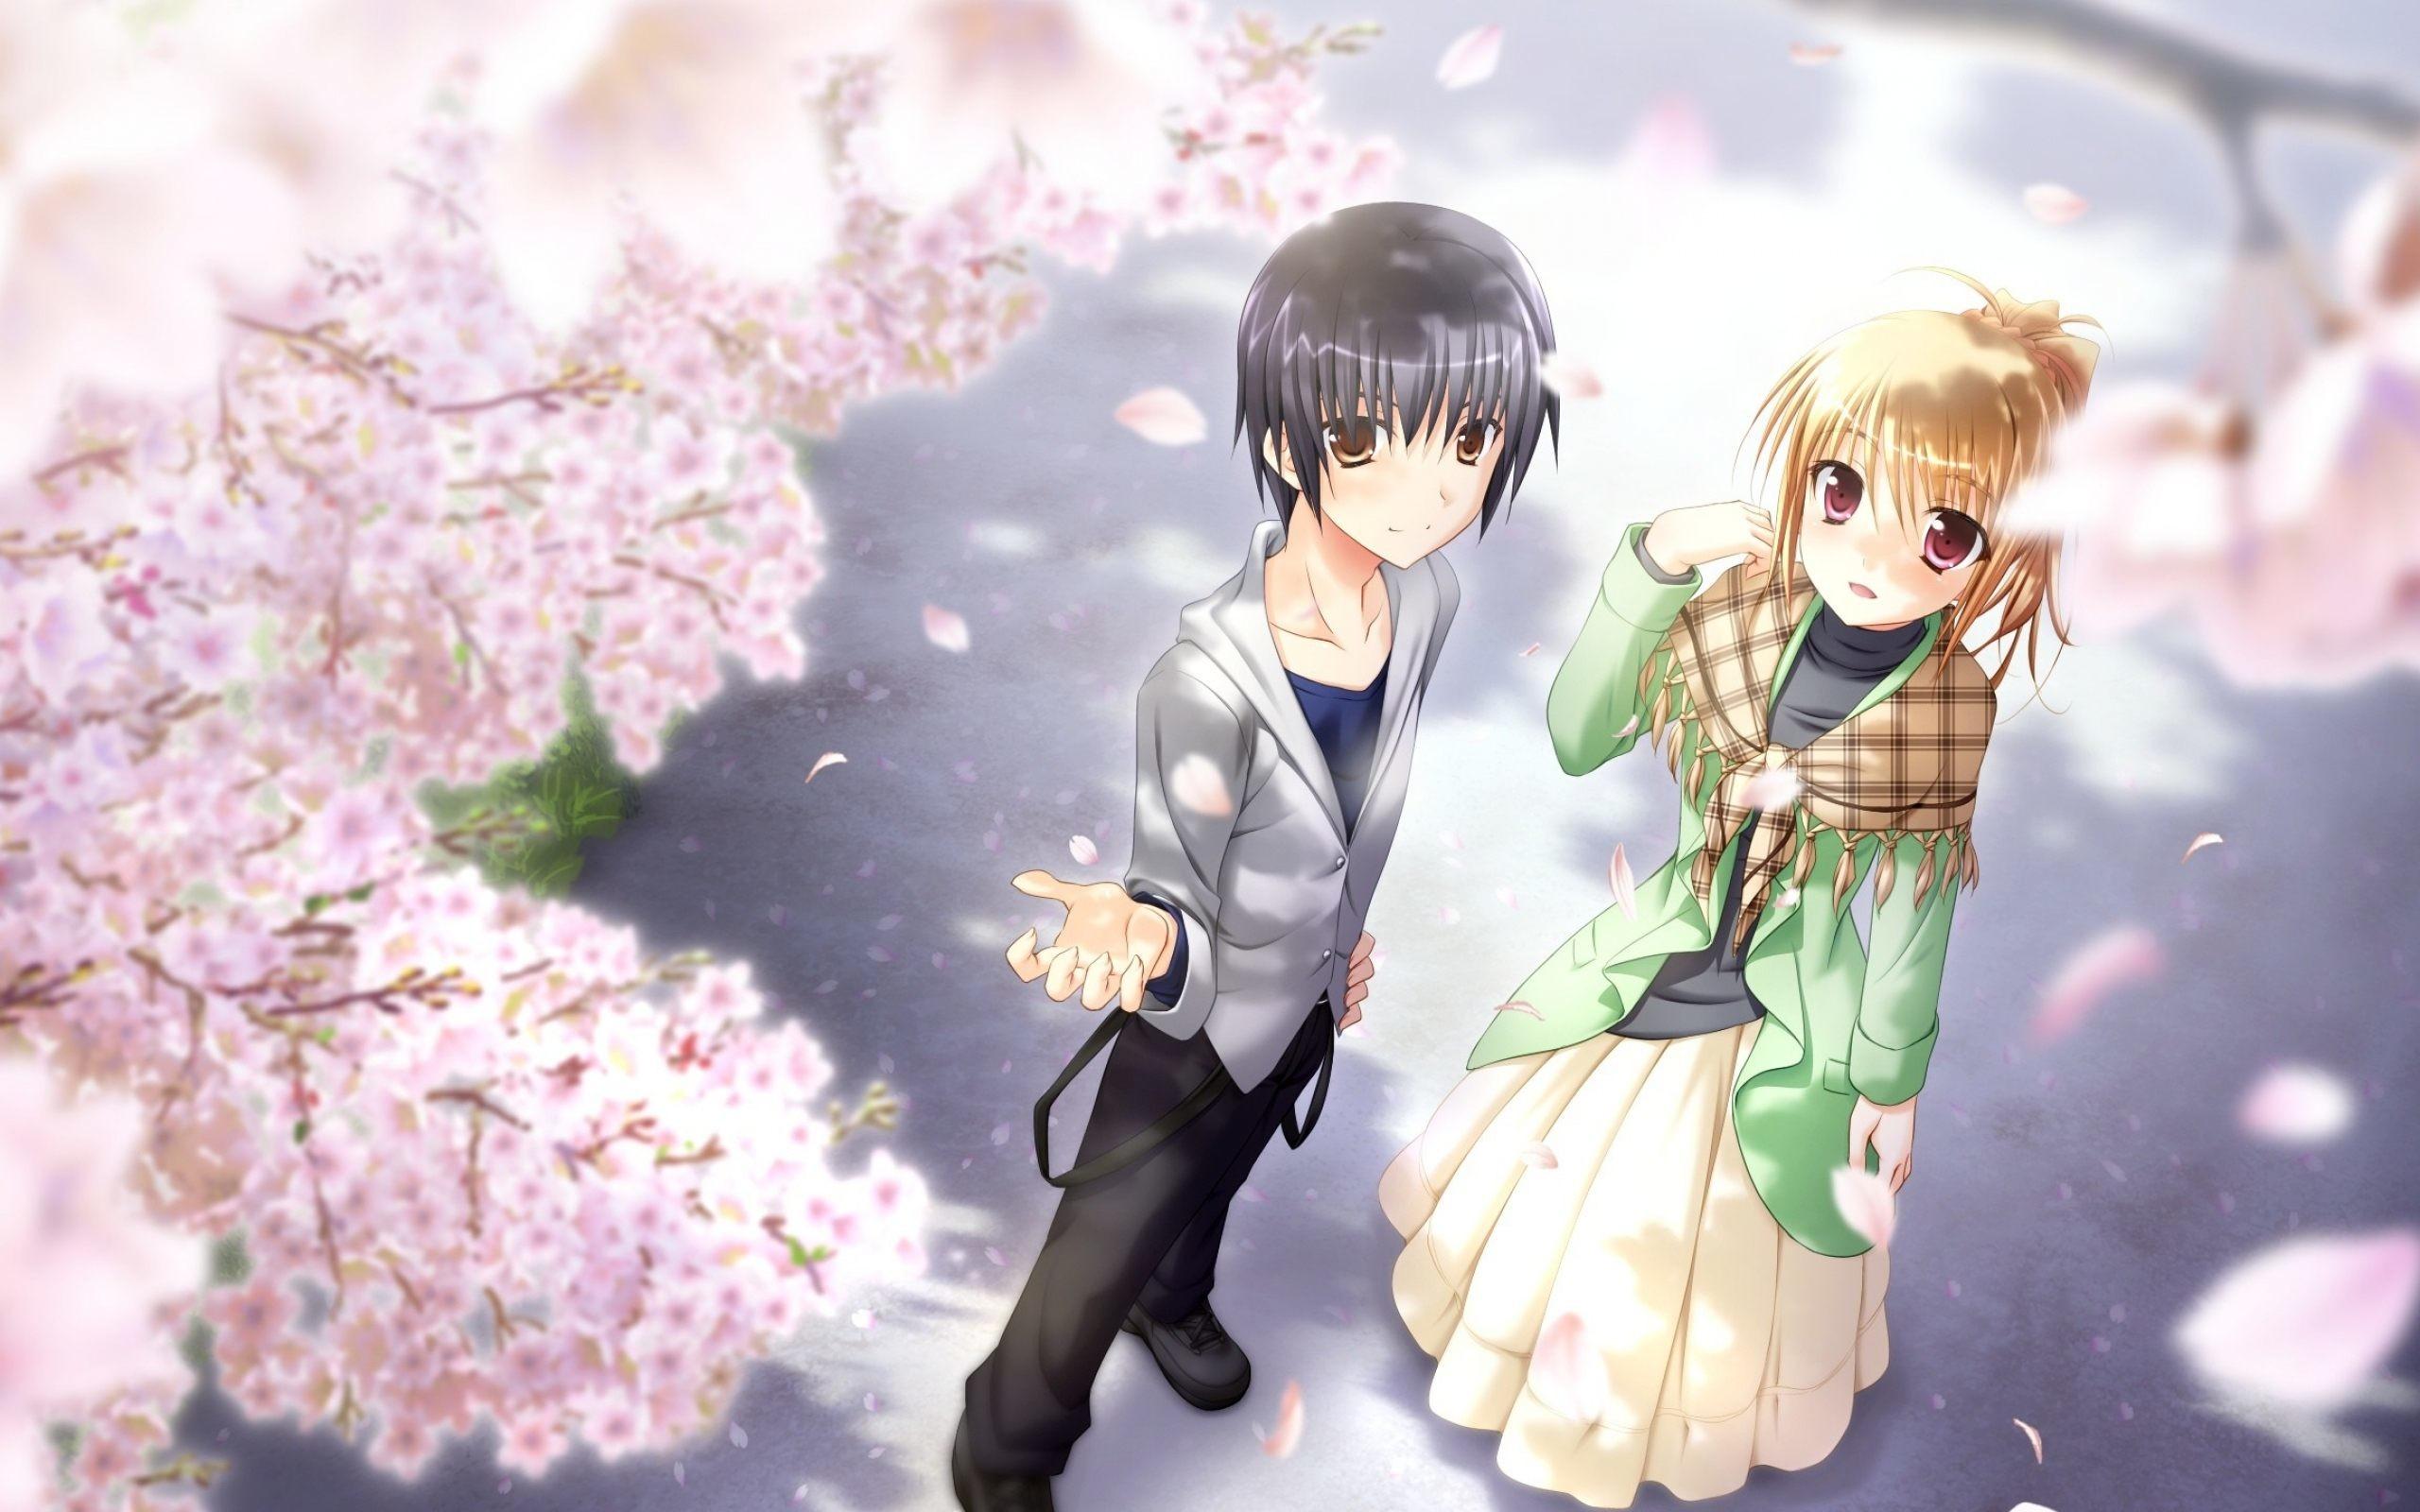 Res: 2560x1600, Pics Photos Wallpaper Hd Cute Anime Couples Wallpaper